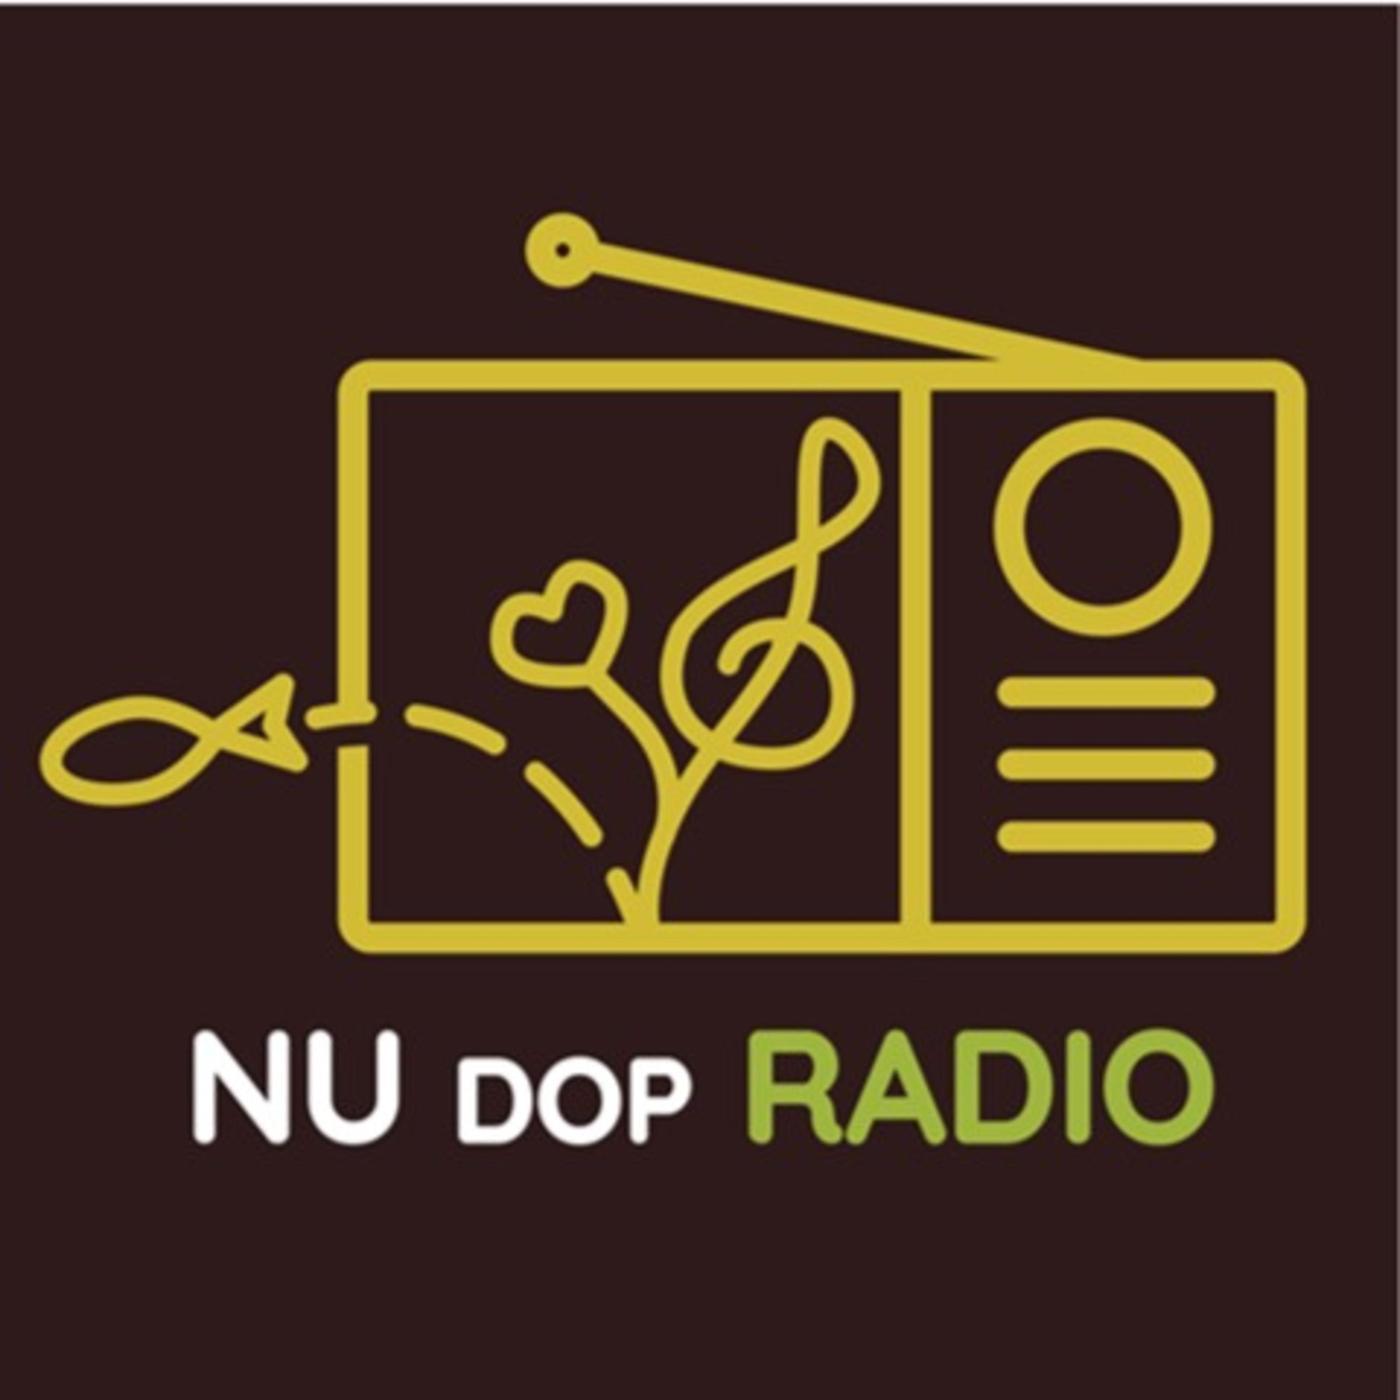 Nu DOP Radio